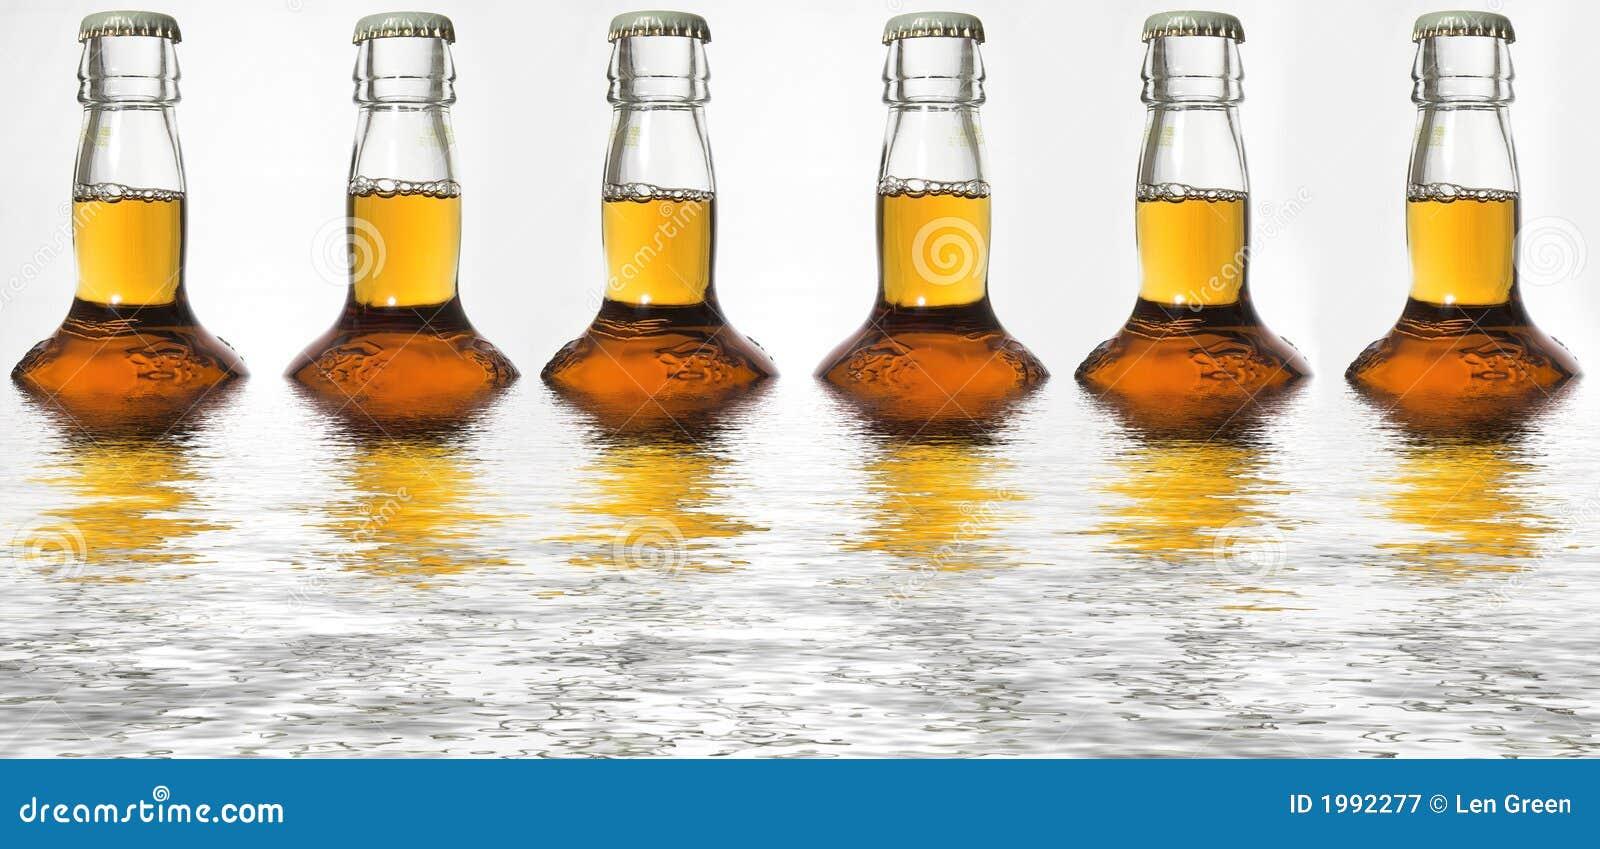 Beer bottle reflections stock image. Image of alcoholism - 1992277